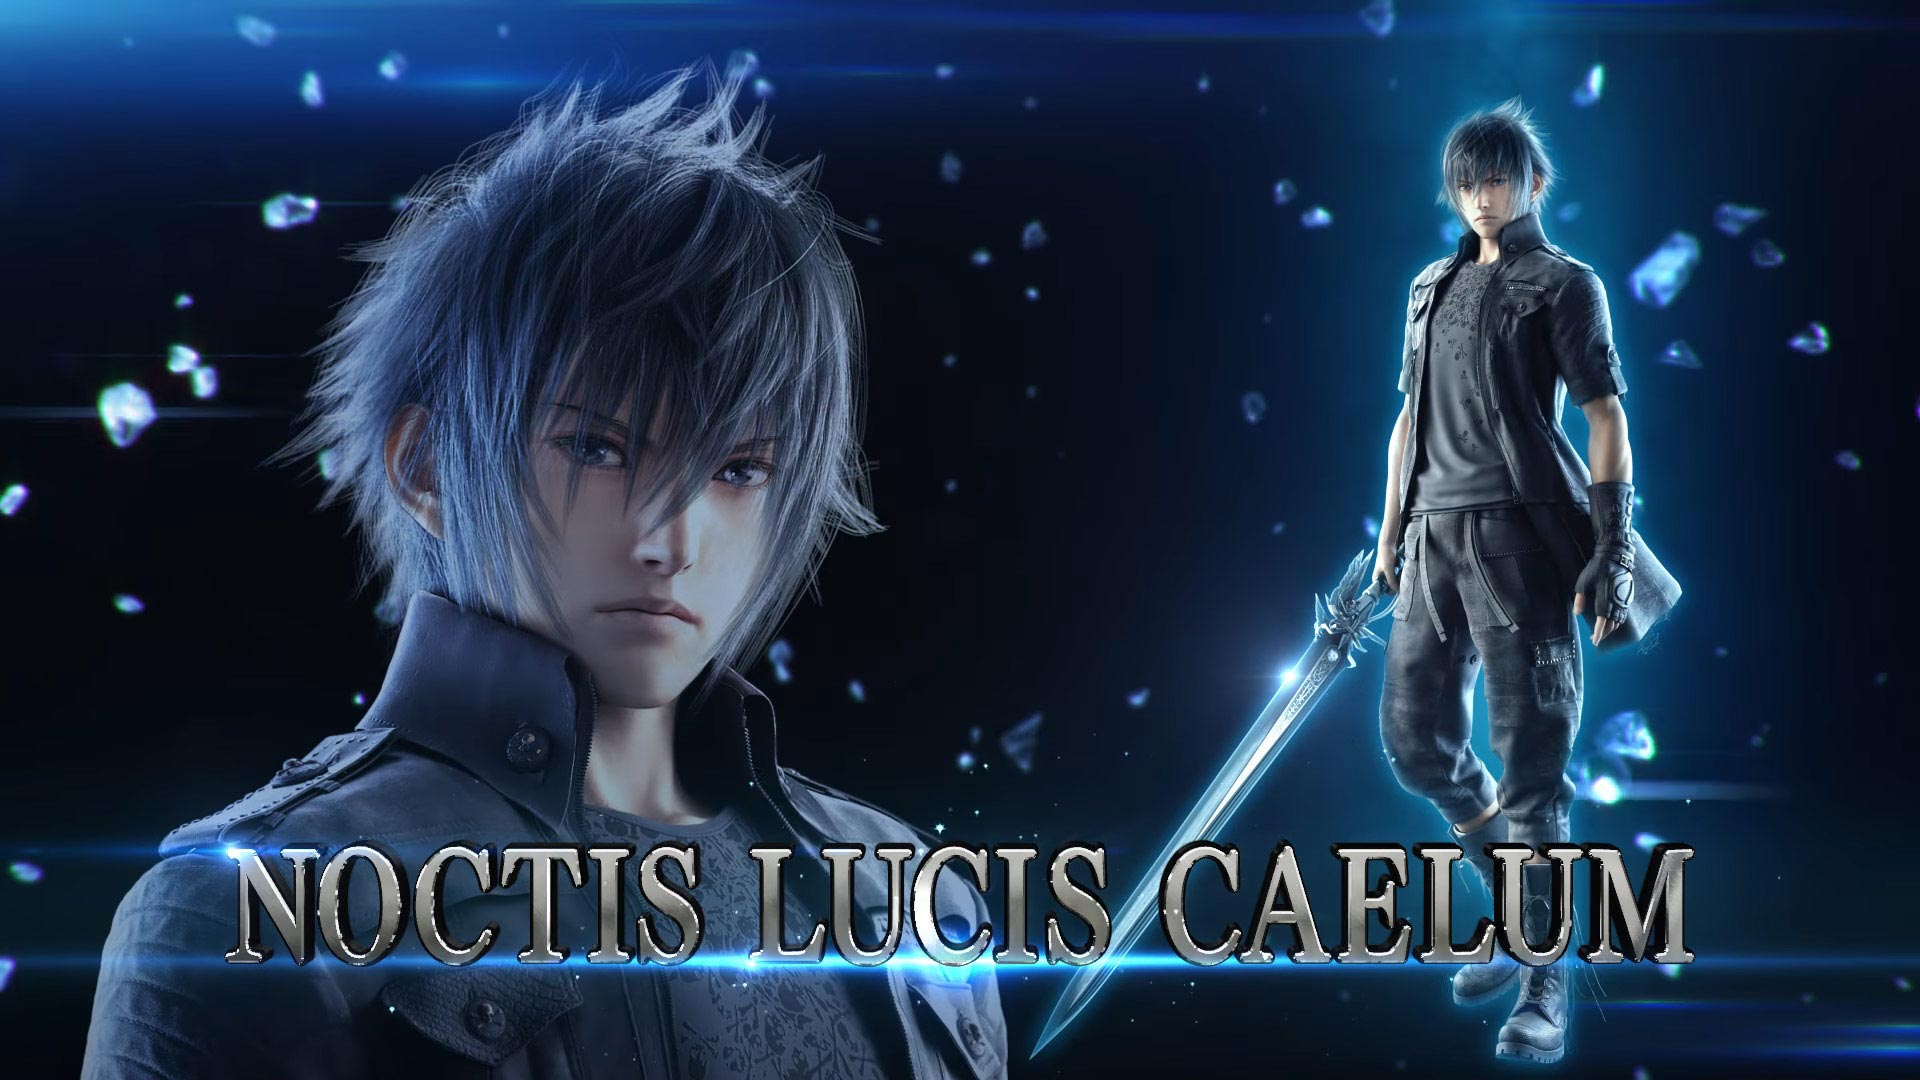 Tekken 7 Noctis Lucis Caelum Reveal Screenshots 1 out of 9 image gallery